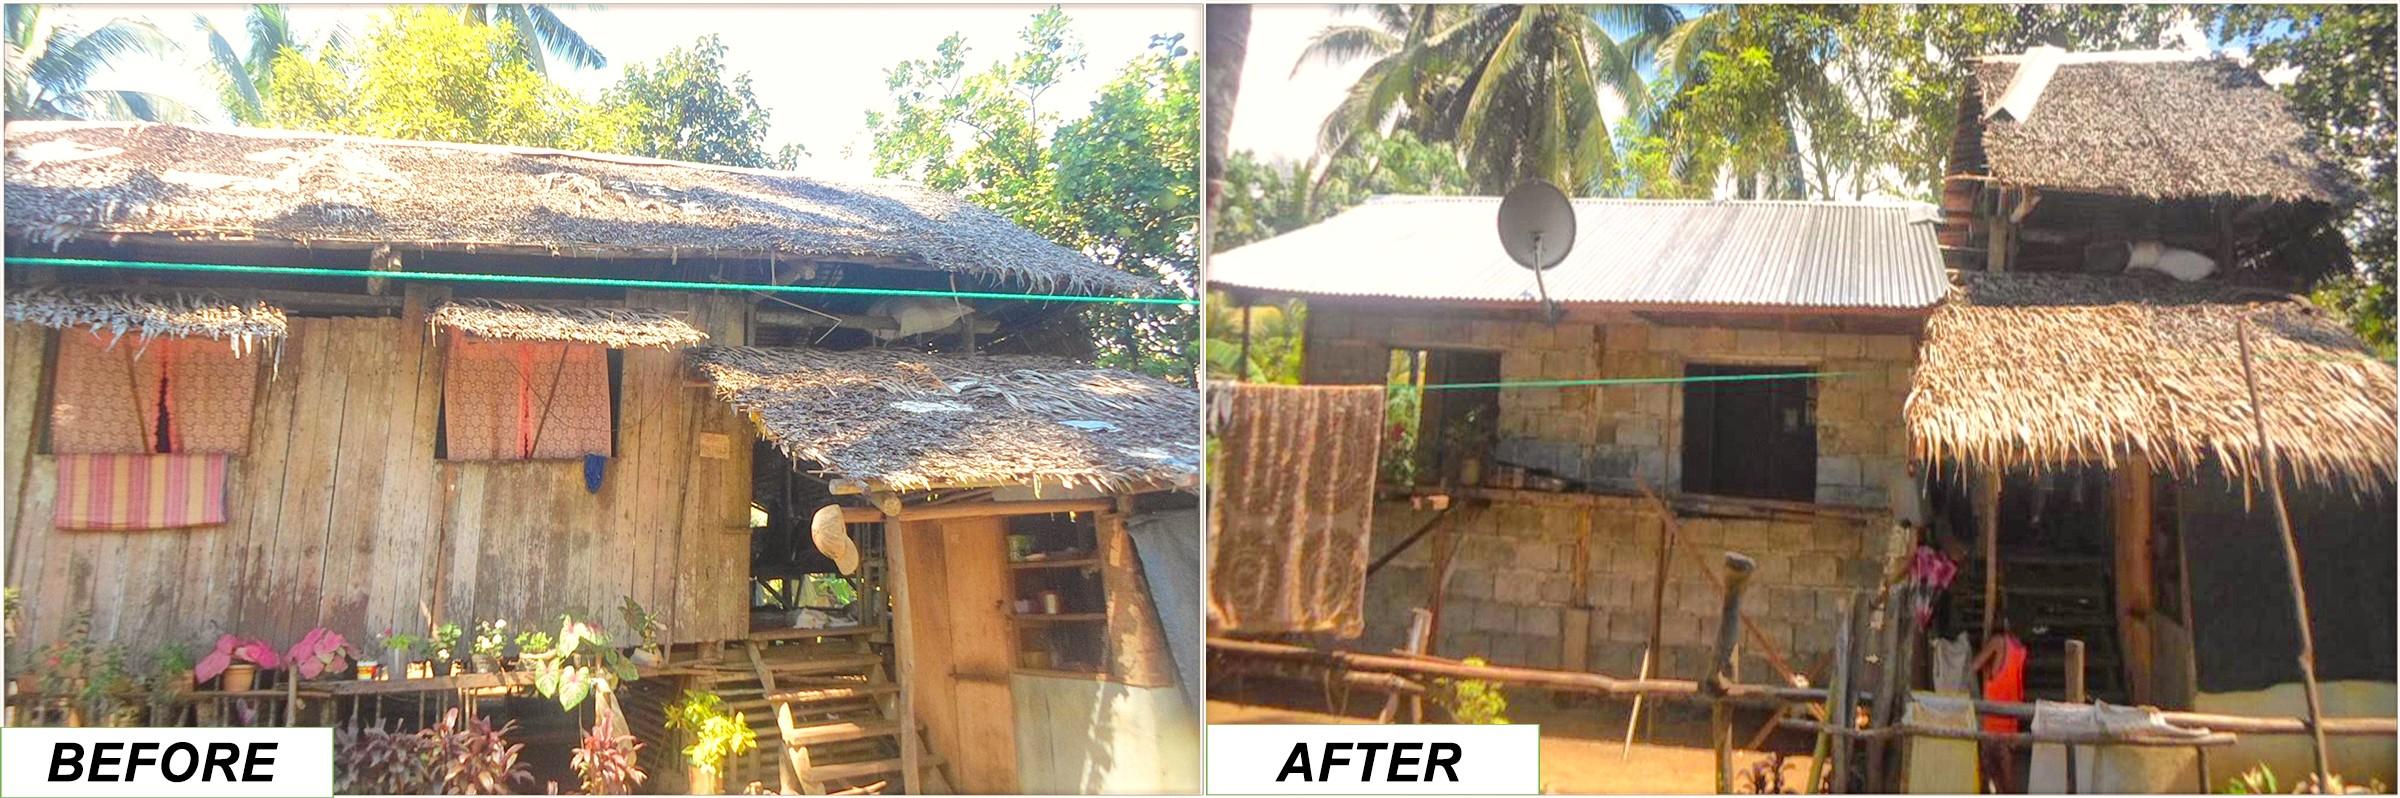 Marcventures' house repair project: A decent home for families